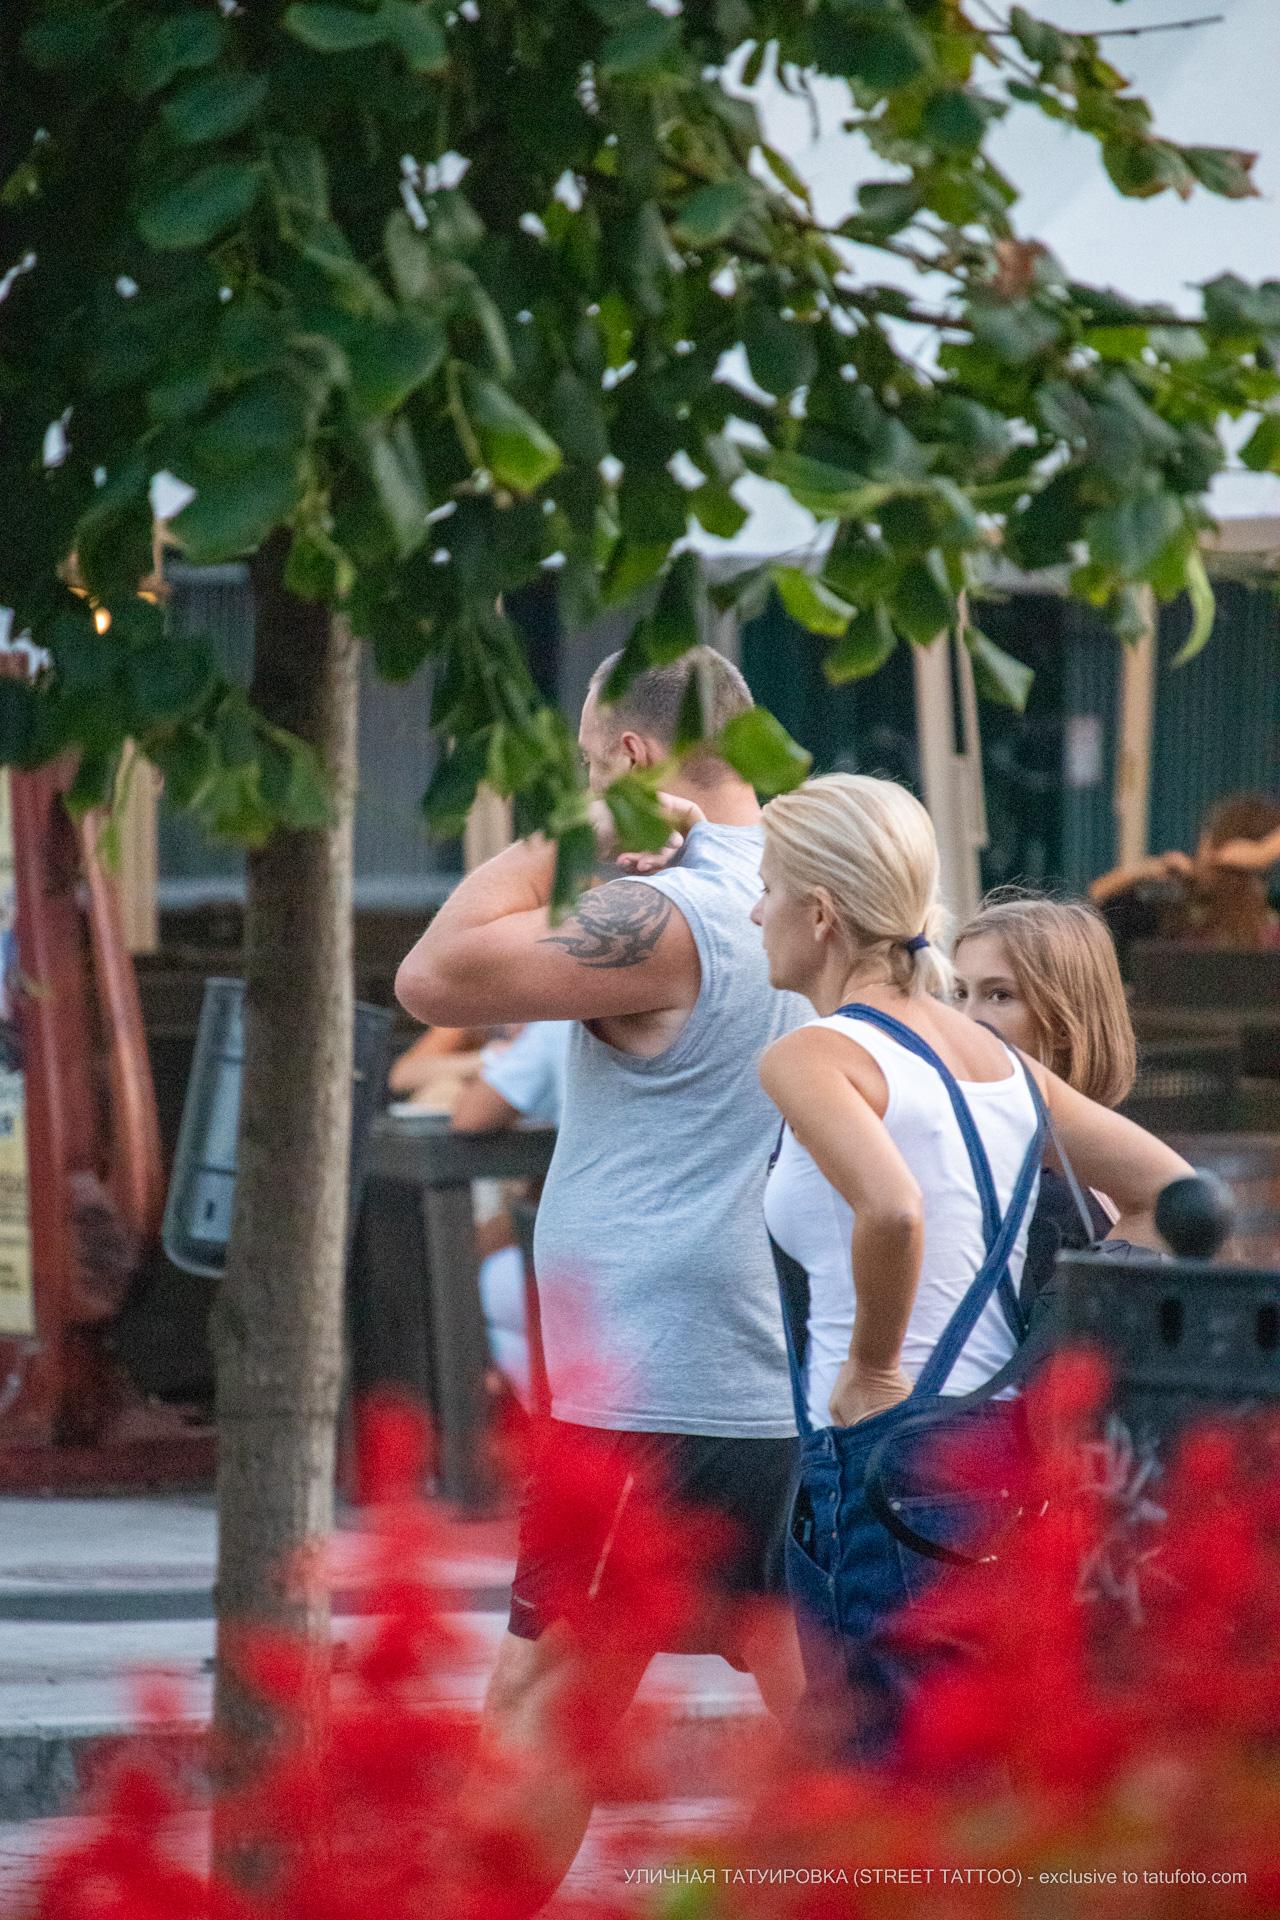 Тату с трайбл узорами на левом плече мужчины – 17.09.2020 – tatufoto.com 3